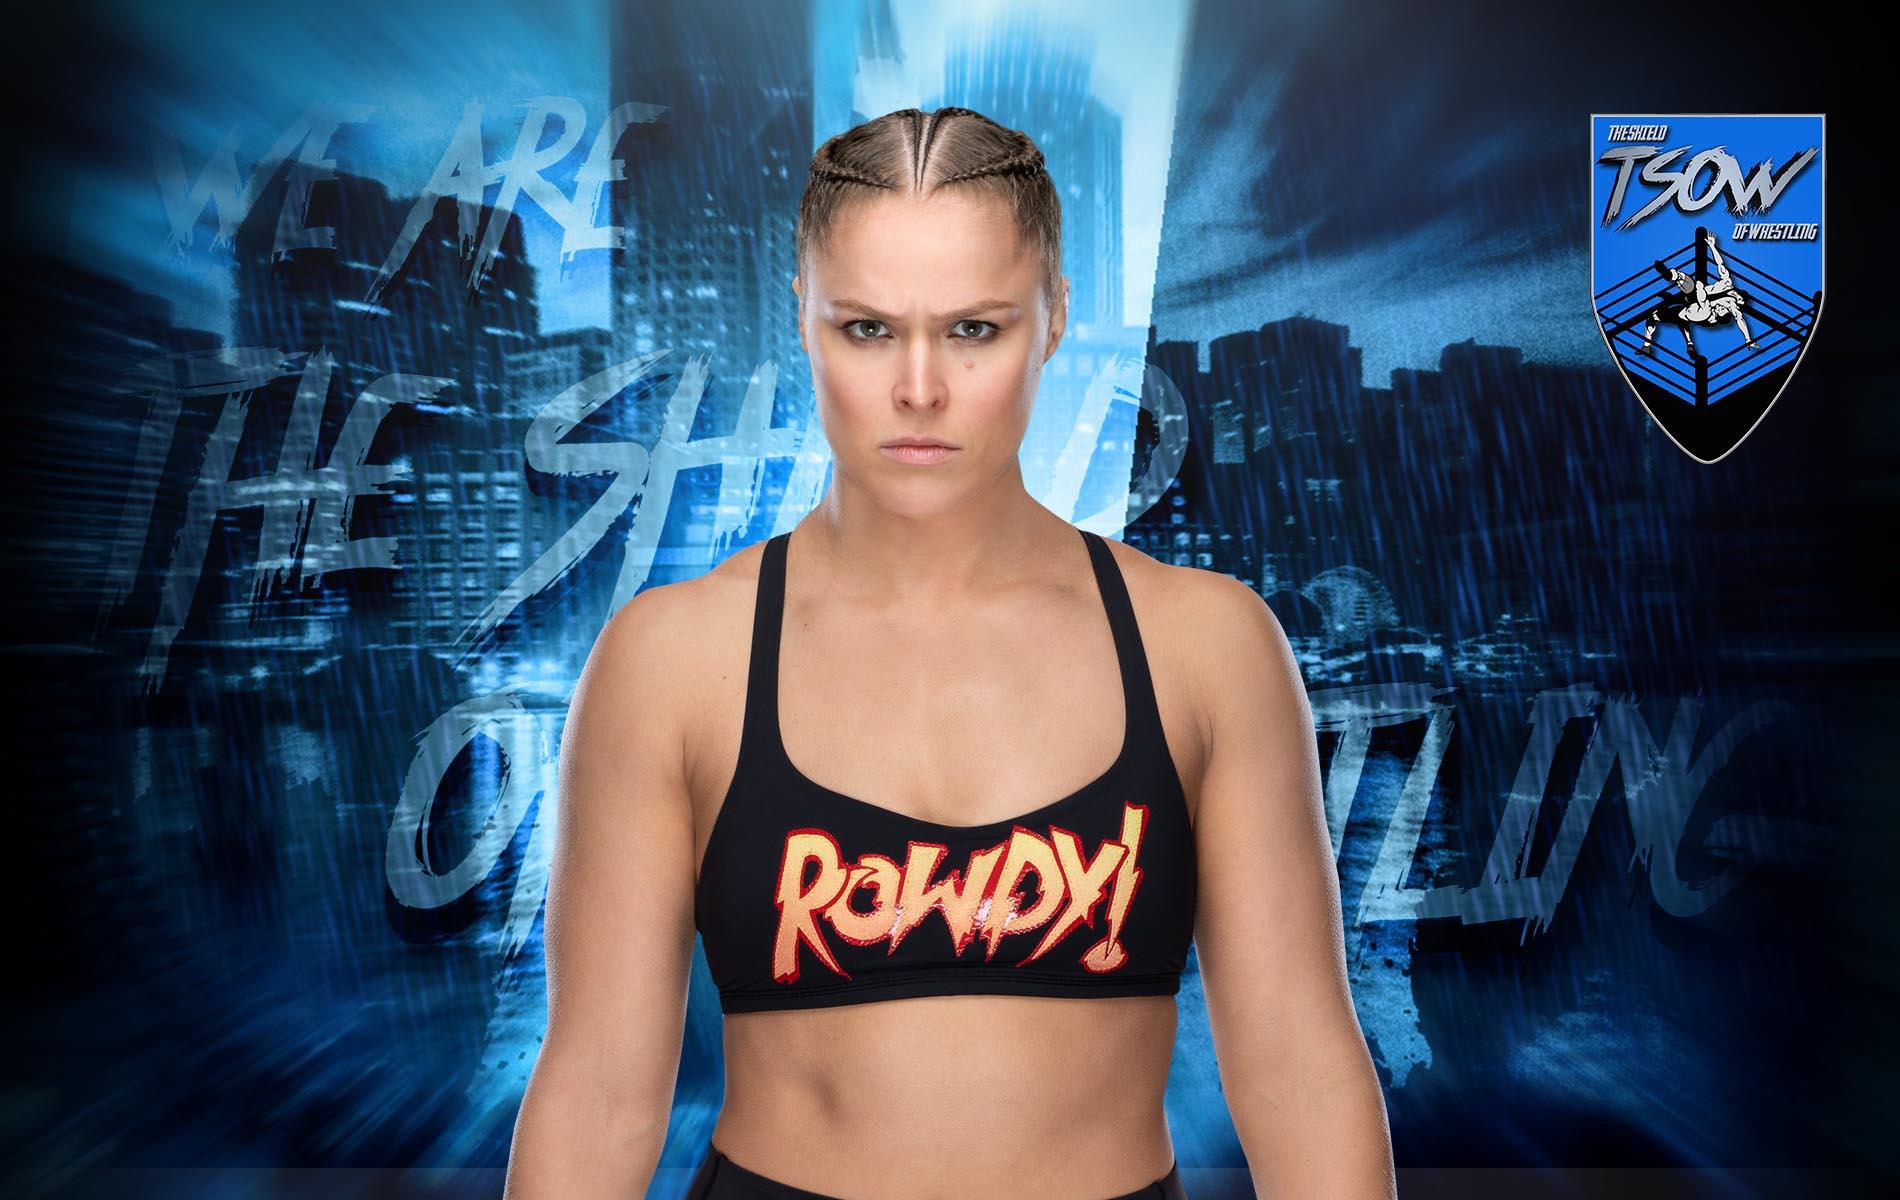 Ronda Rousey tornerà alla Royal Rumble?